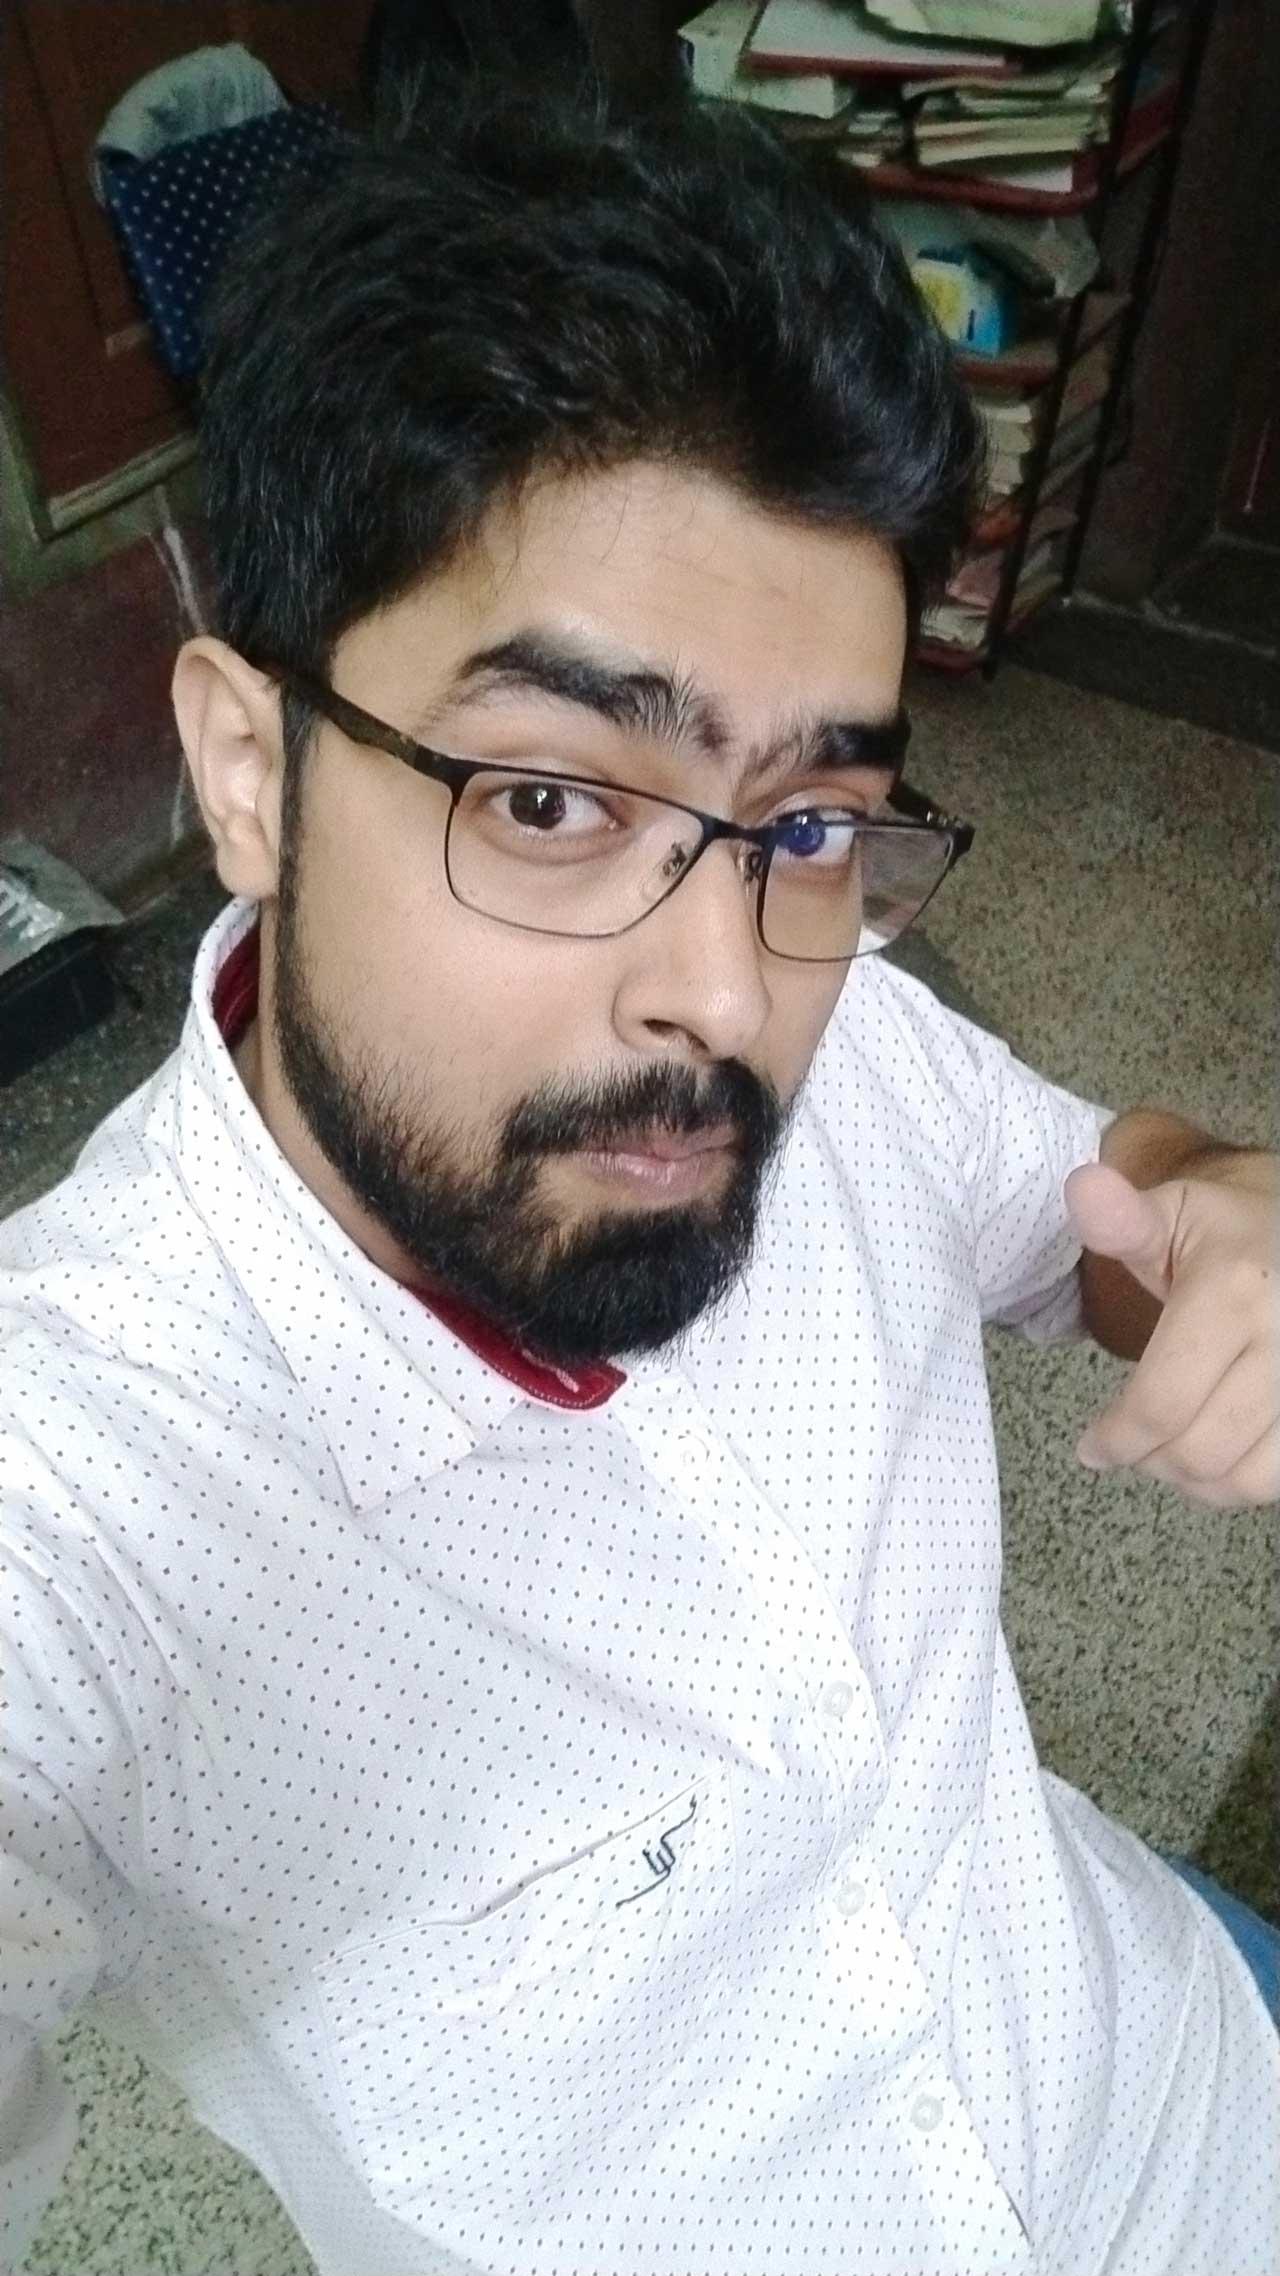 Vivo-Nex-Indoor-Selfie-Shot-Nishith-Gupta-Techniblogic